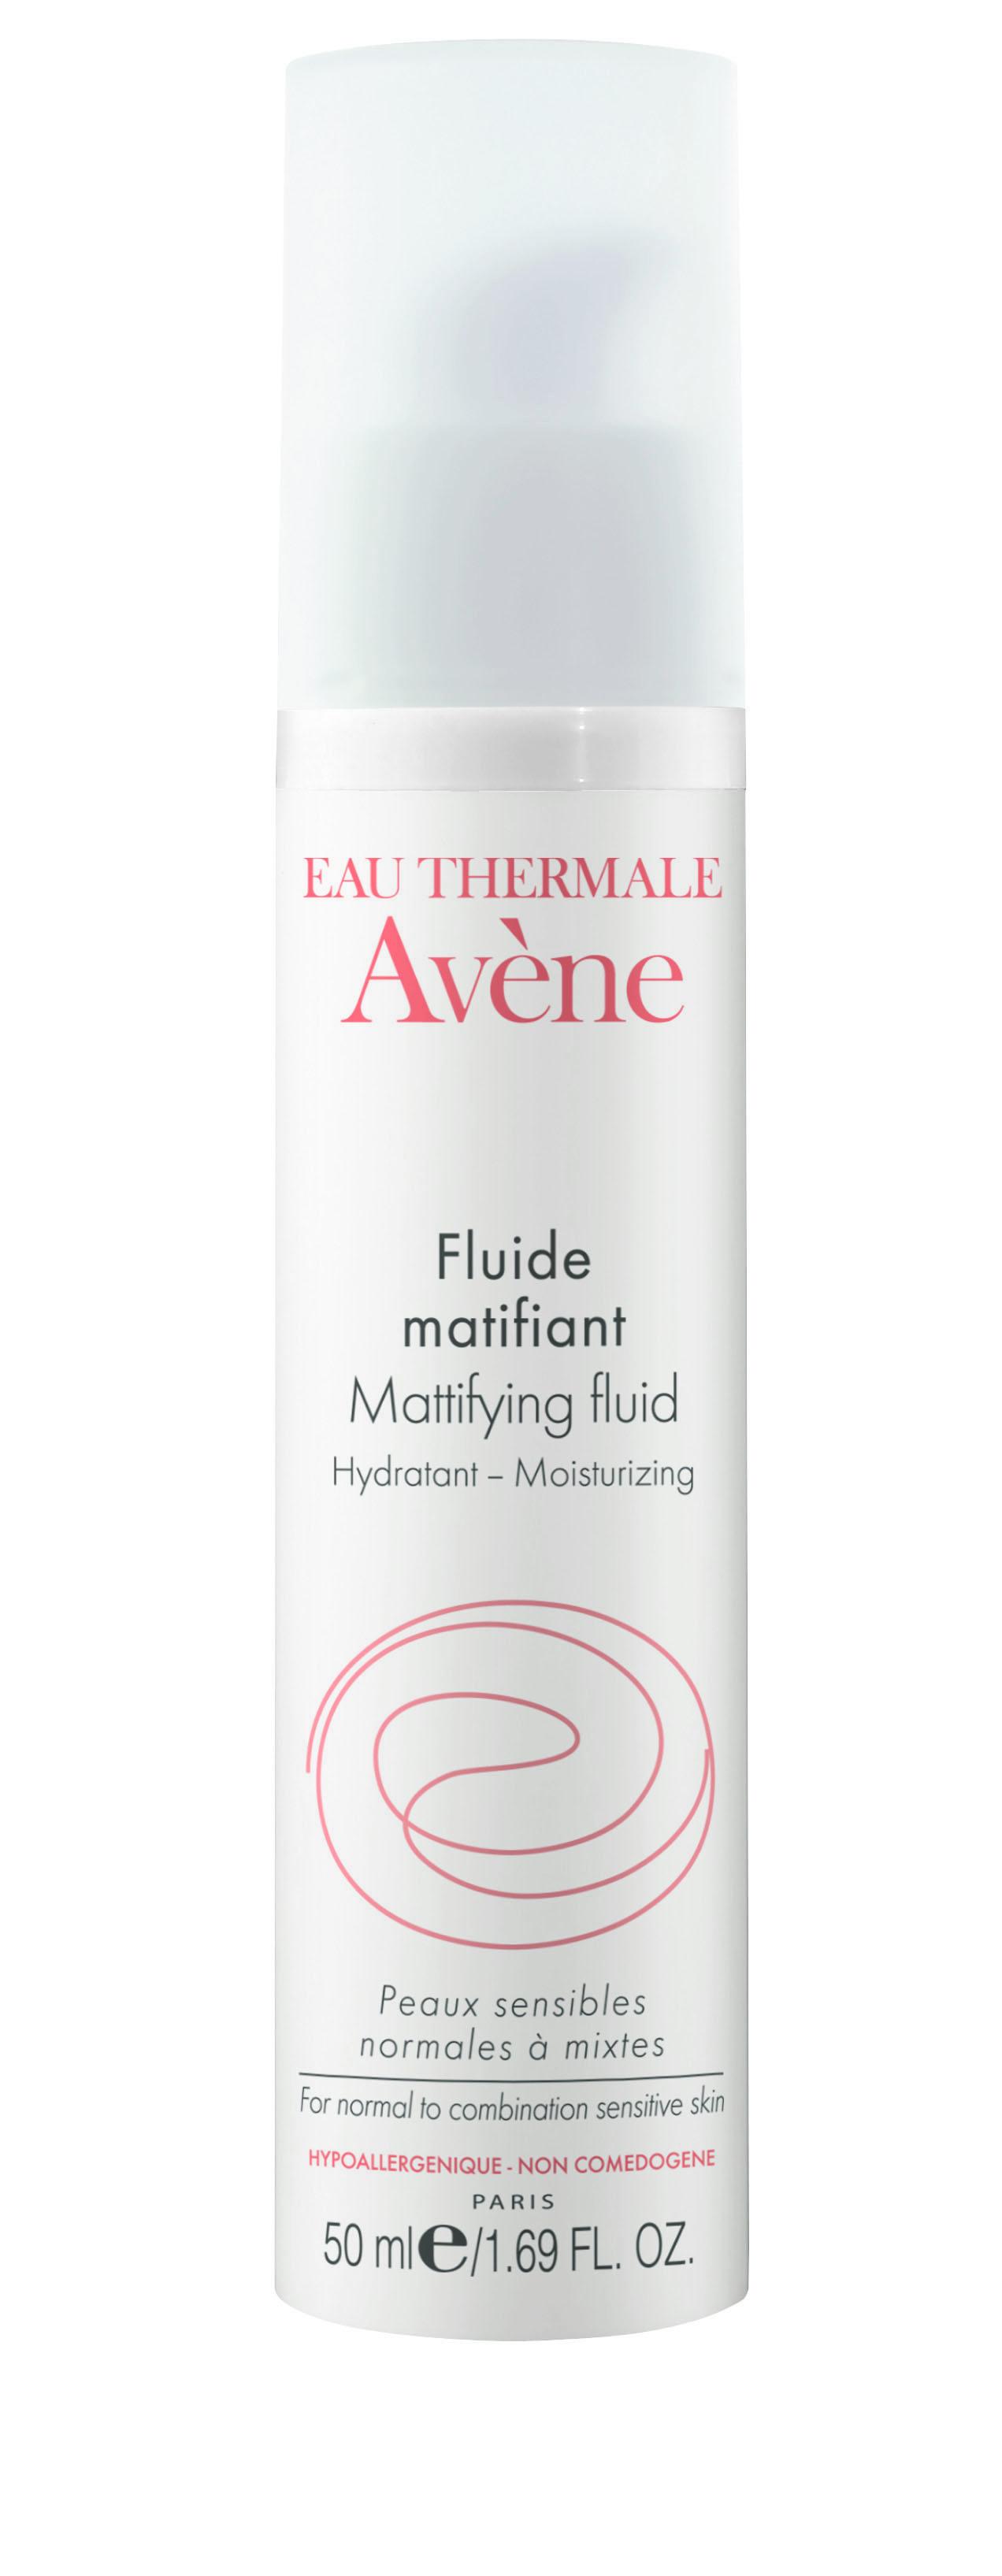 Image AVENE SOINS ESSENTIELS fluide matifiant hydratant